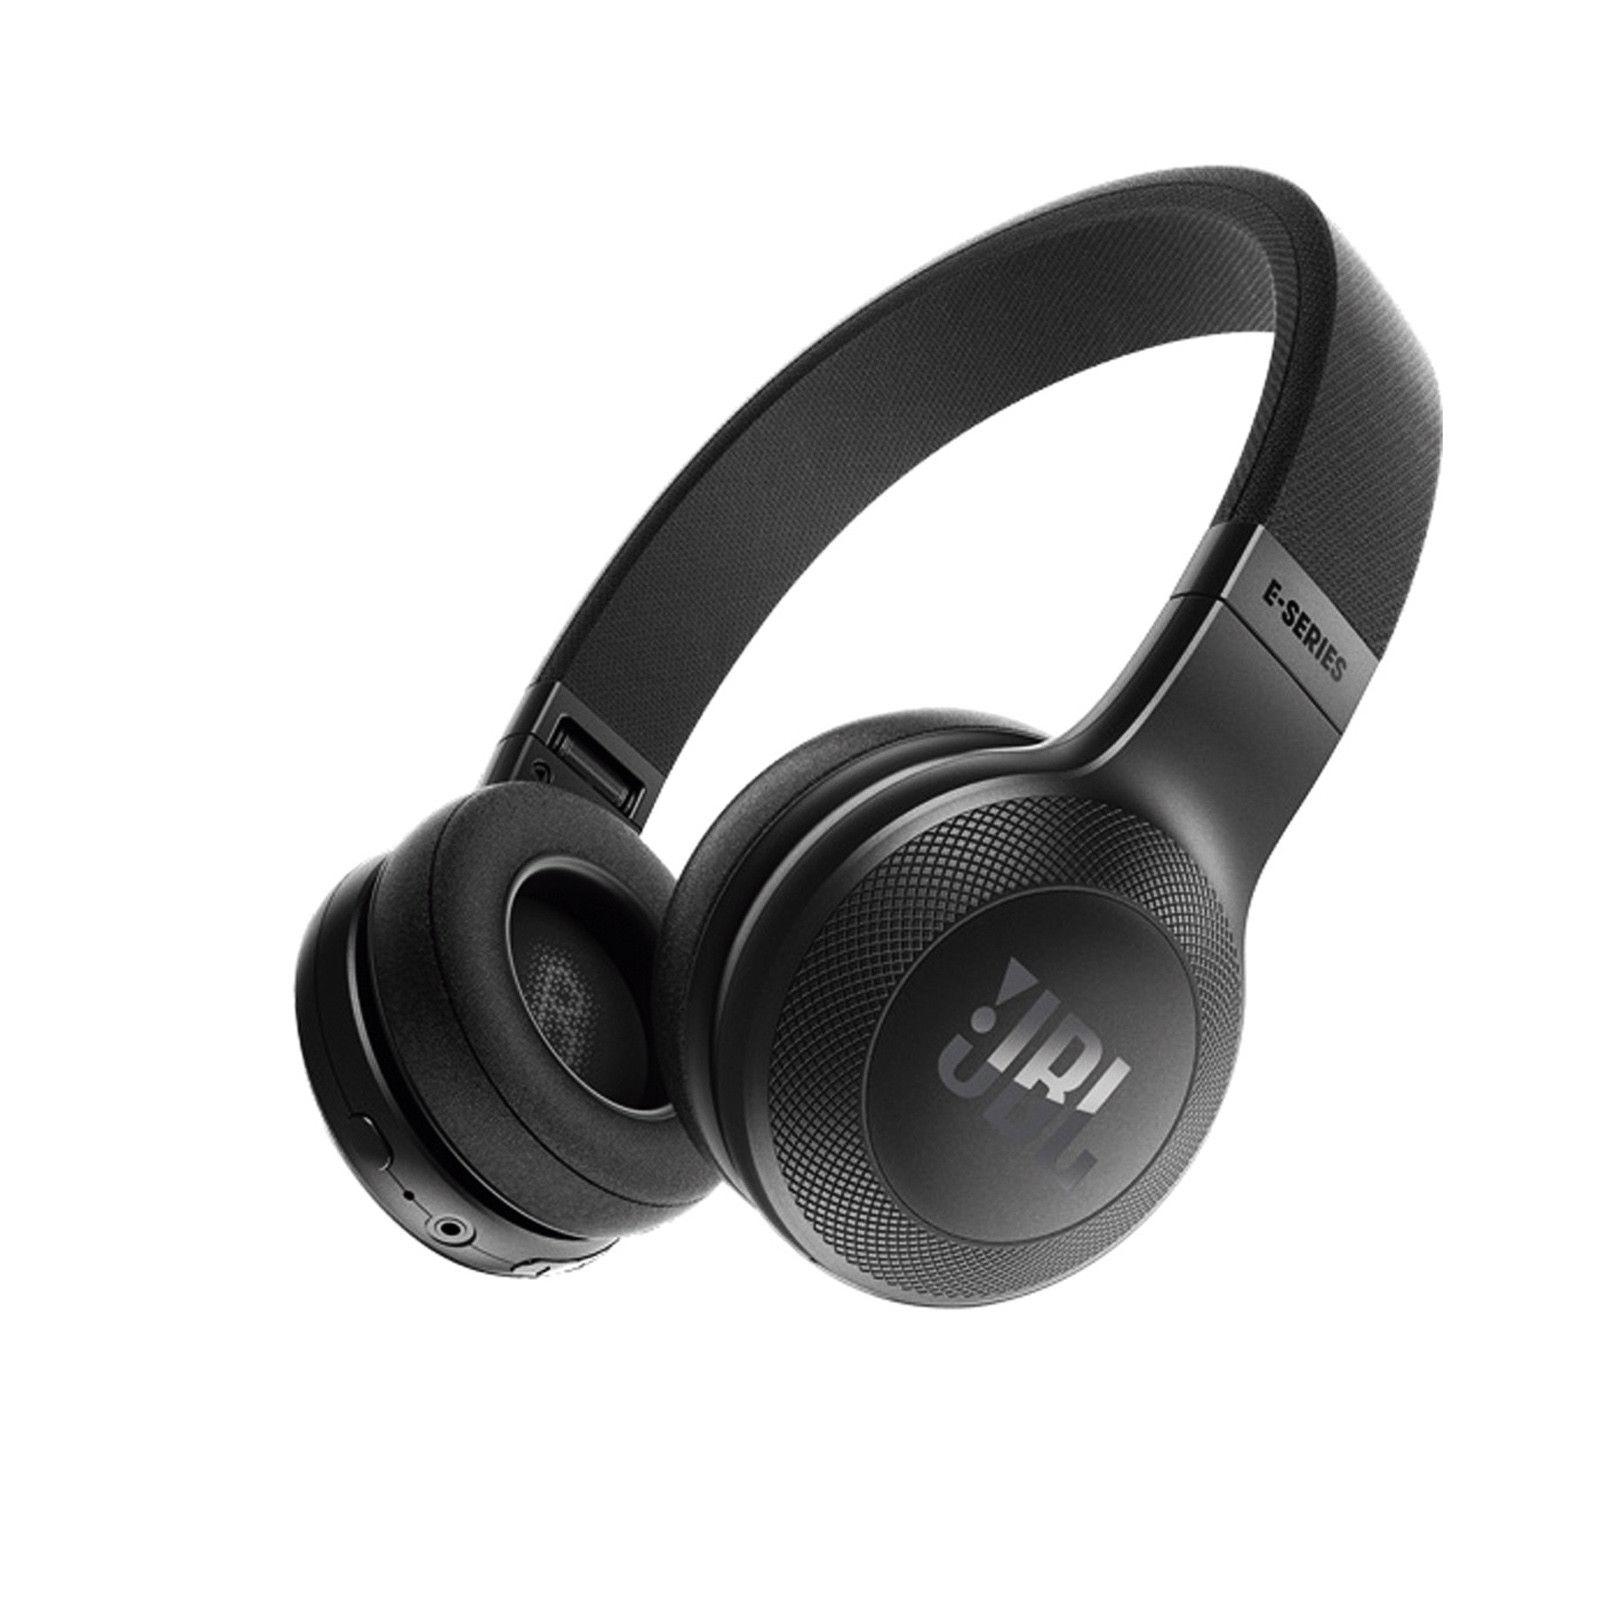 JBL E45 BT Wireless Bluetooth On-Ear Stereo-Kopfhörer Schwarz-NEU+OVP